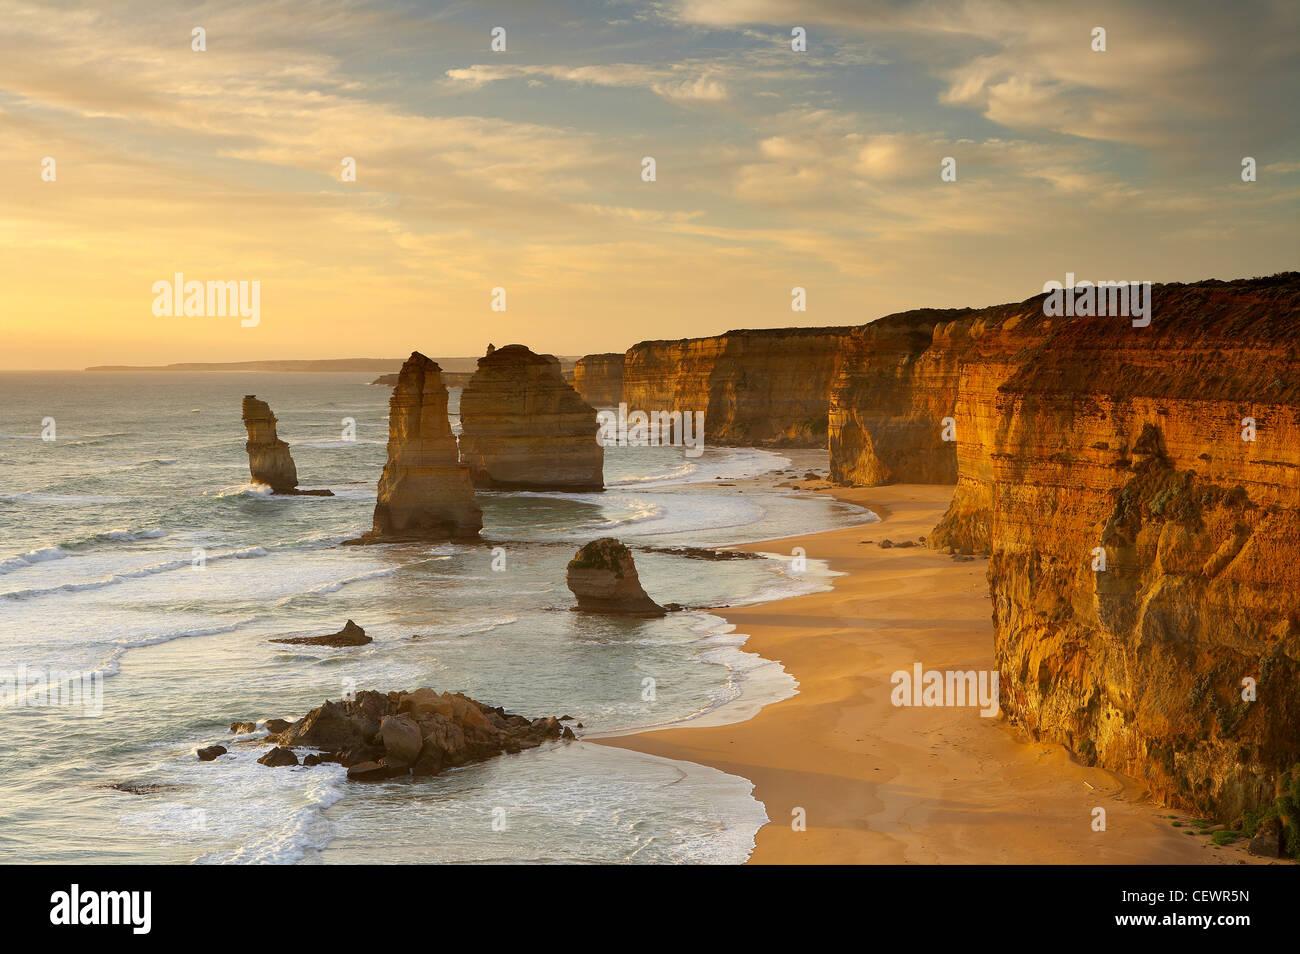 La erosionada costa de los Doce Apóstoles, Port Campbell National Park, Great Ocean Road, Victoria, Australia Imagen De Stock